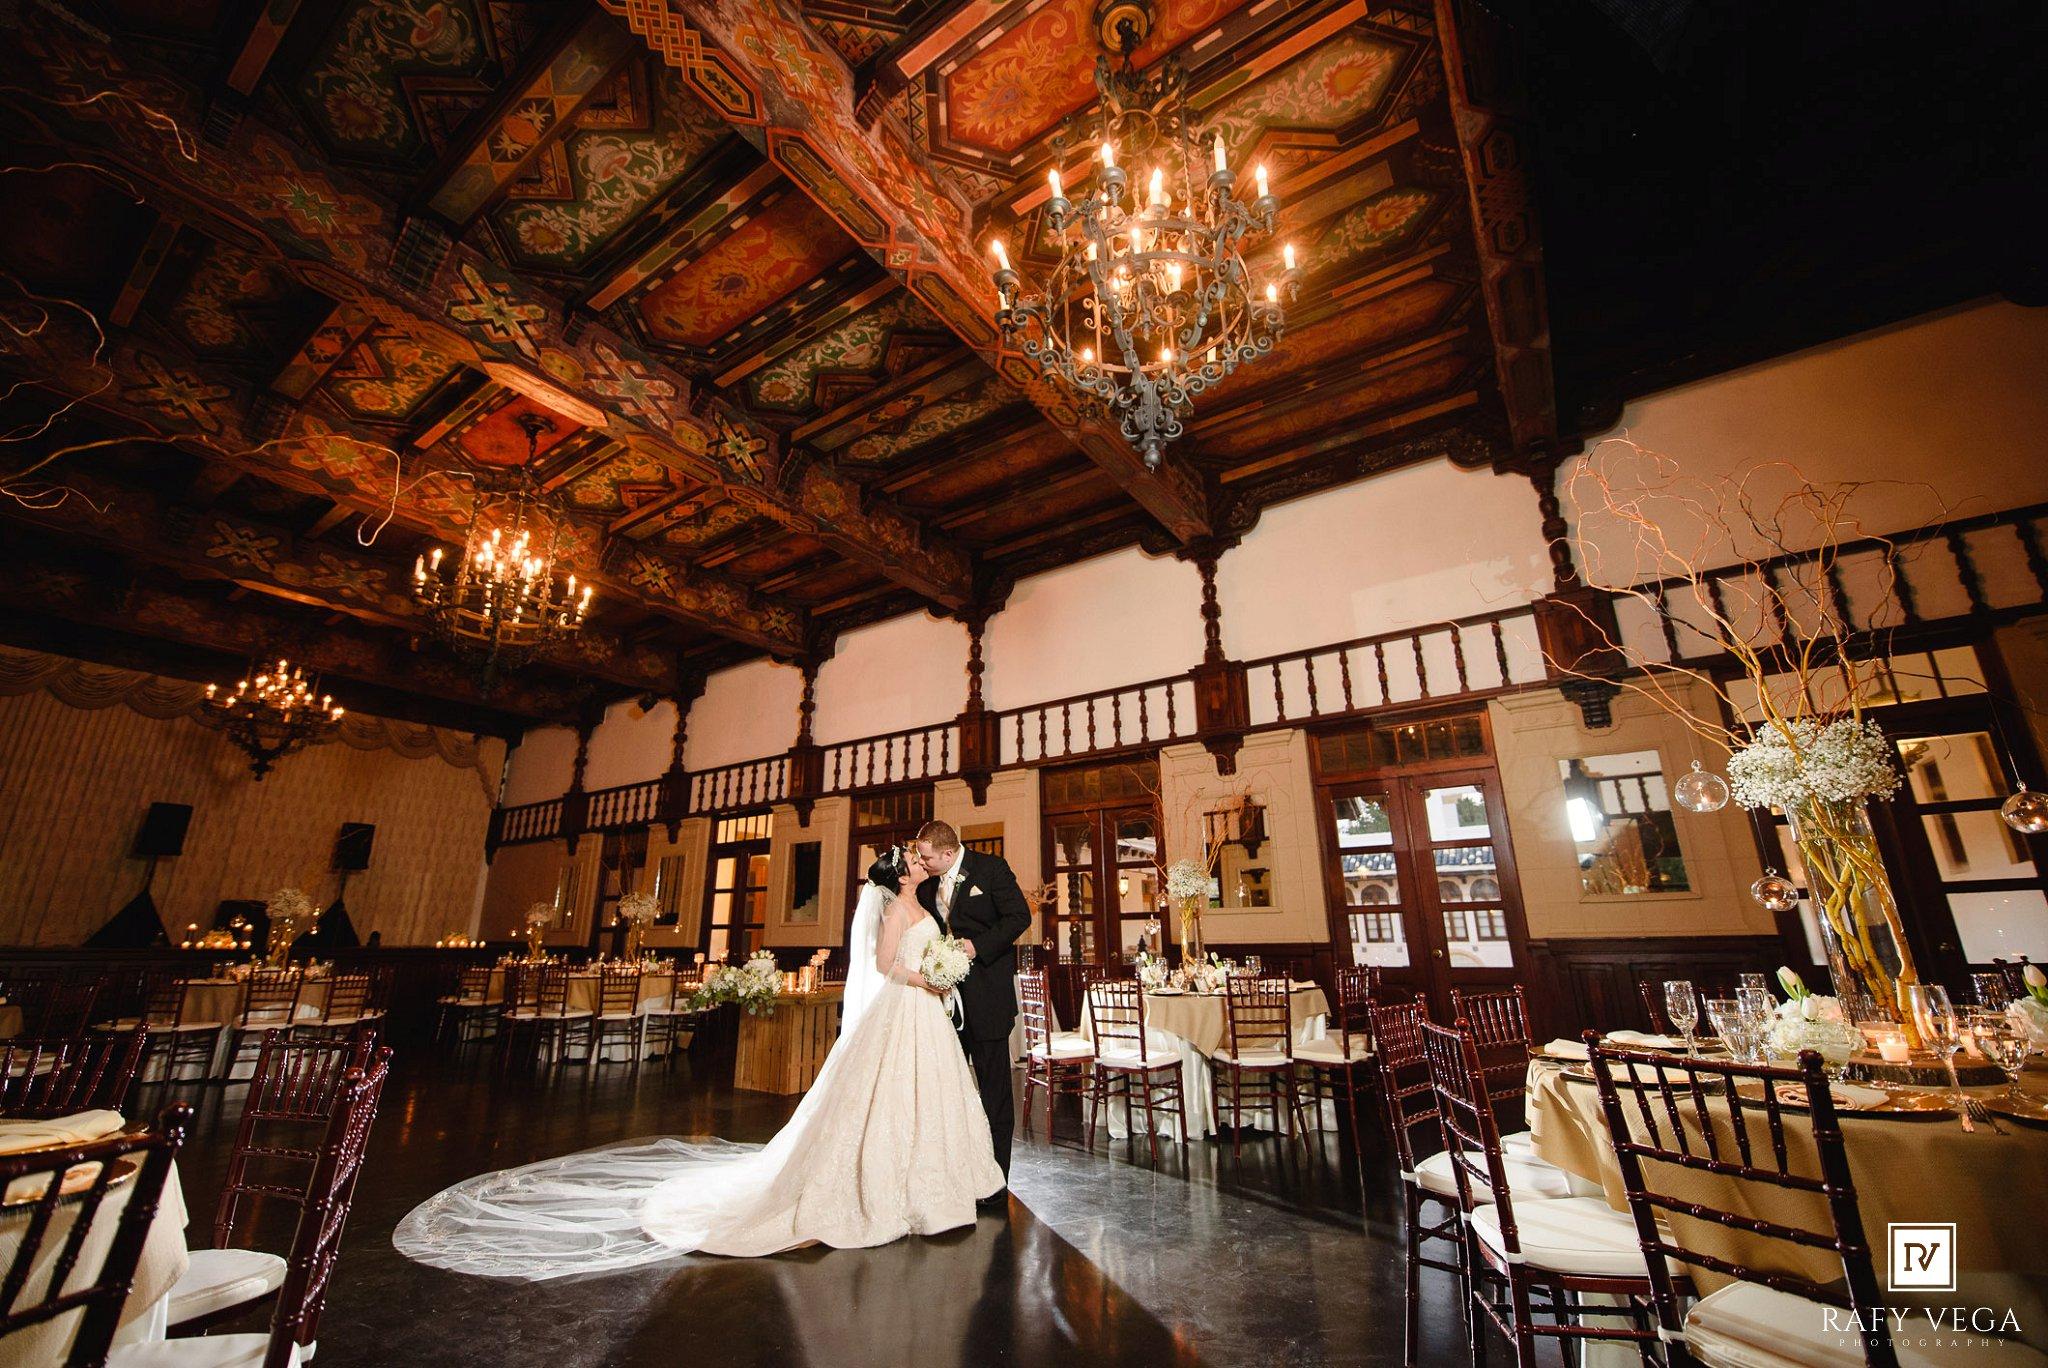 Rom ntica boda en casa espa a viejo san juan for Restaurante puerto rico madrid